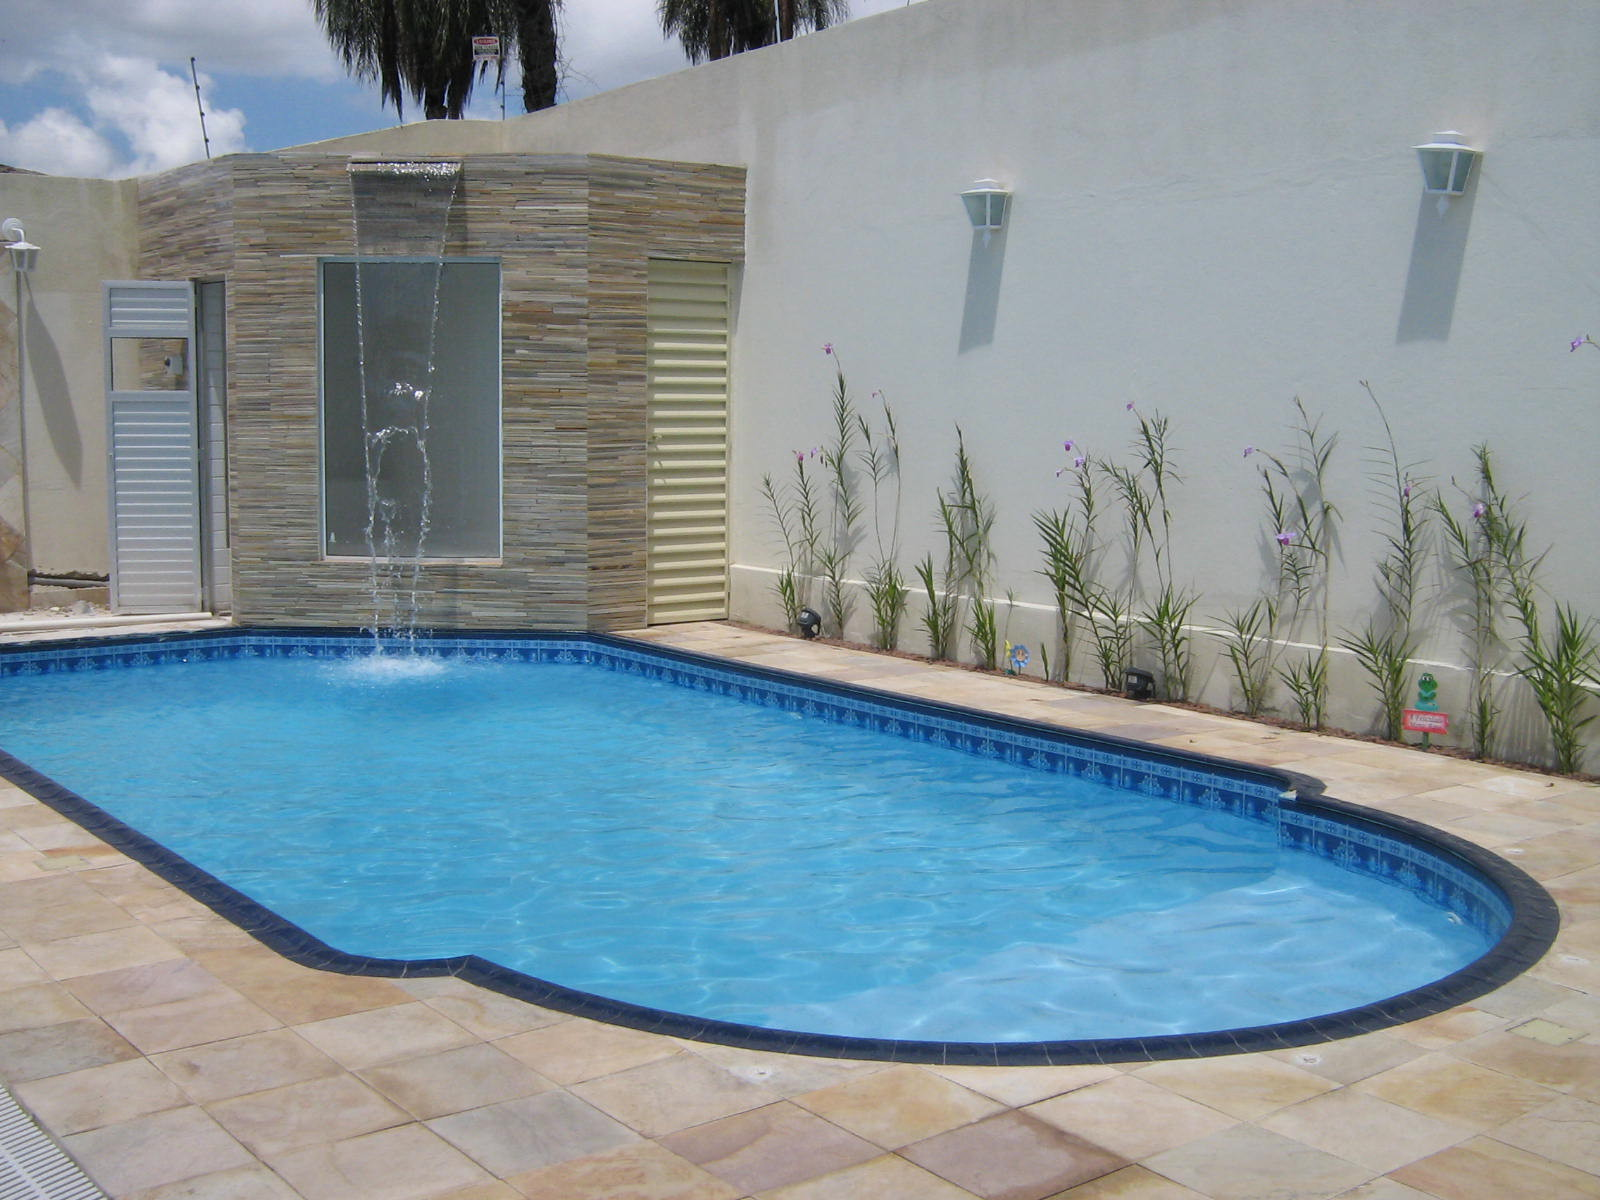 Piscinas planalto piso anti derrapante e anti termico for Pisos ceramicos externos